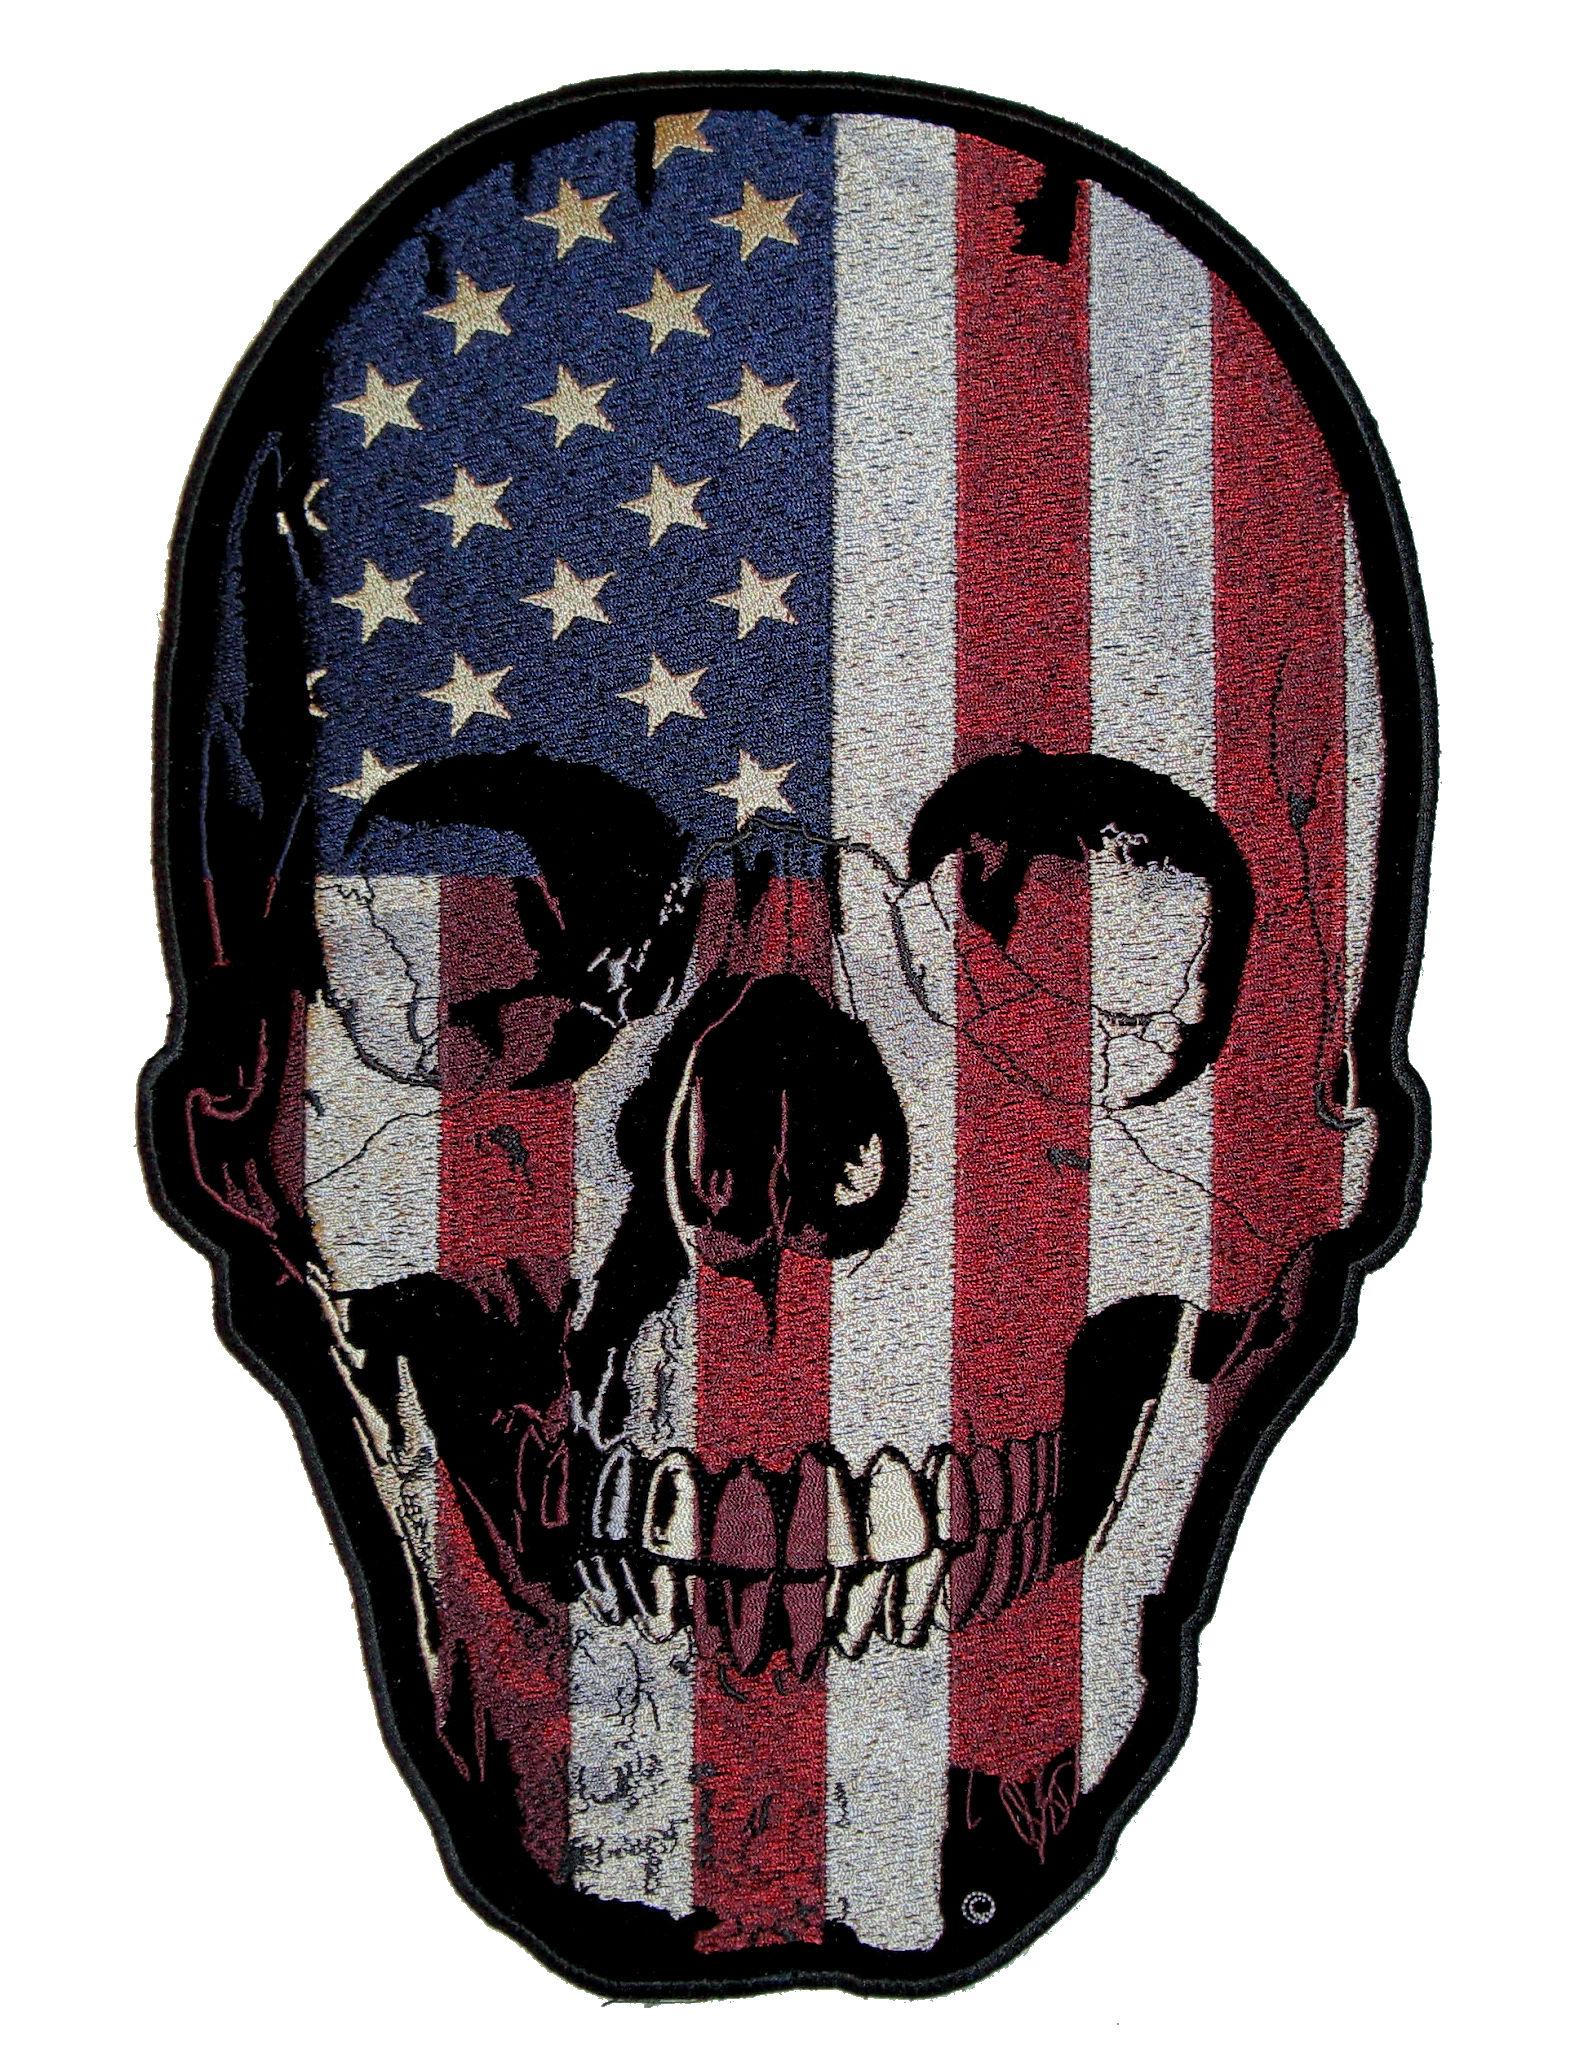 Biker Vest Patches >> Patriotic USA American Flag Skull Biker Patch – Quality Biker Patches